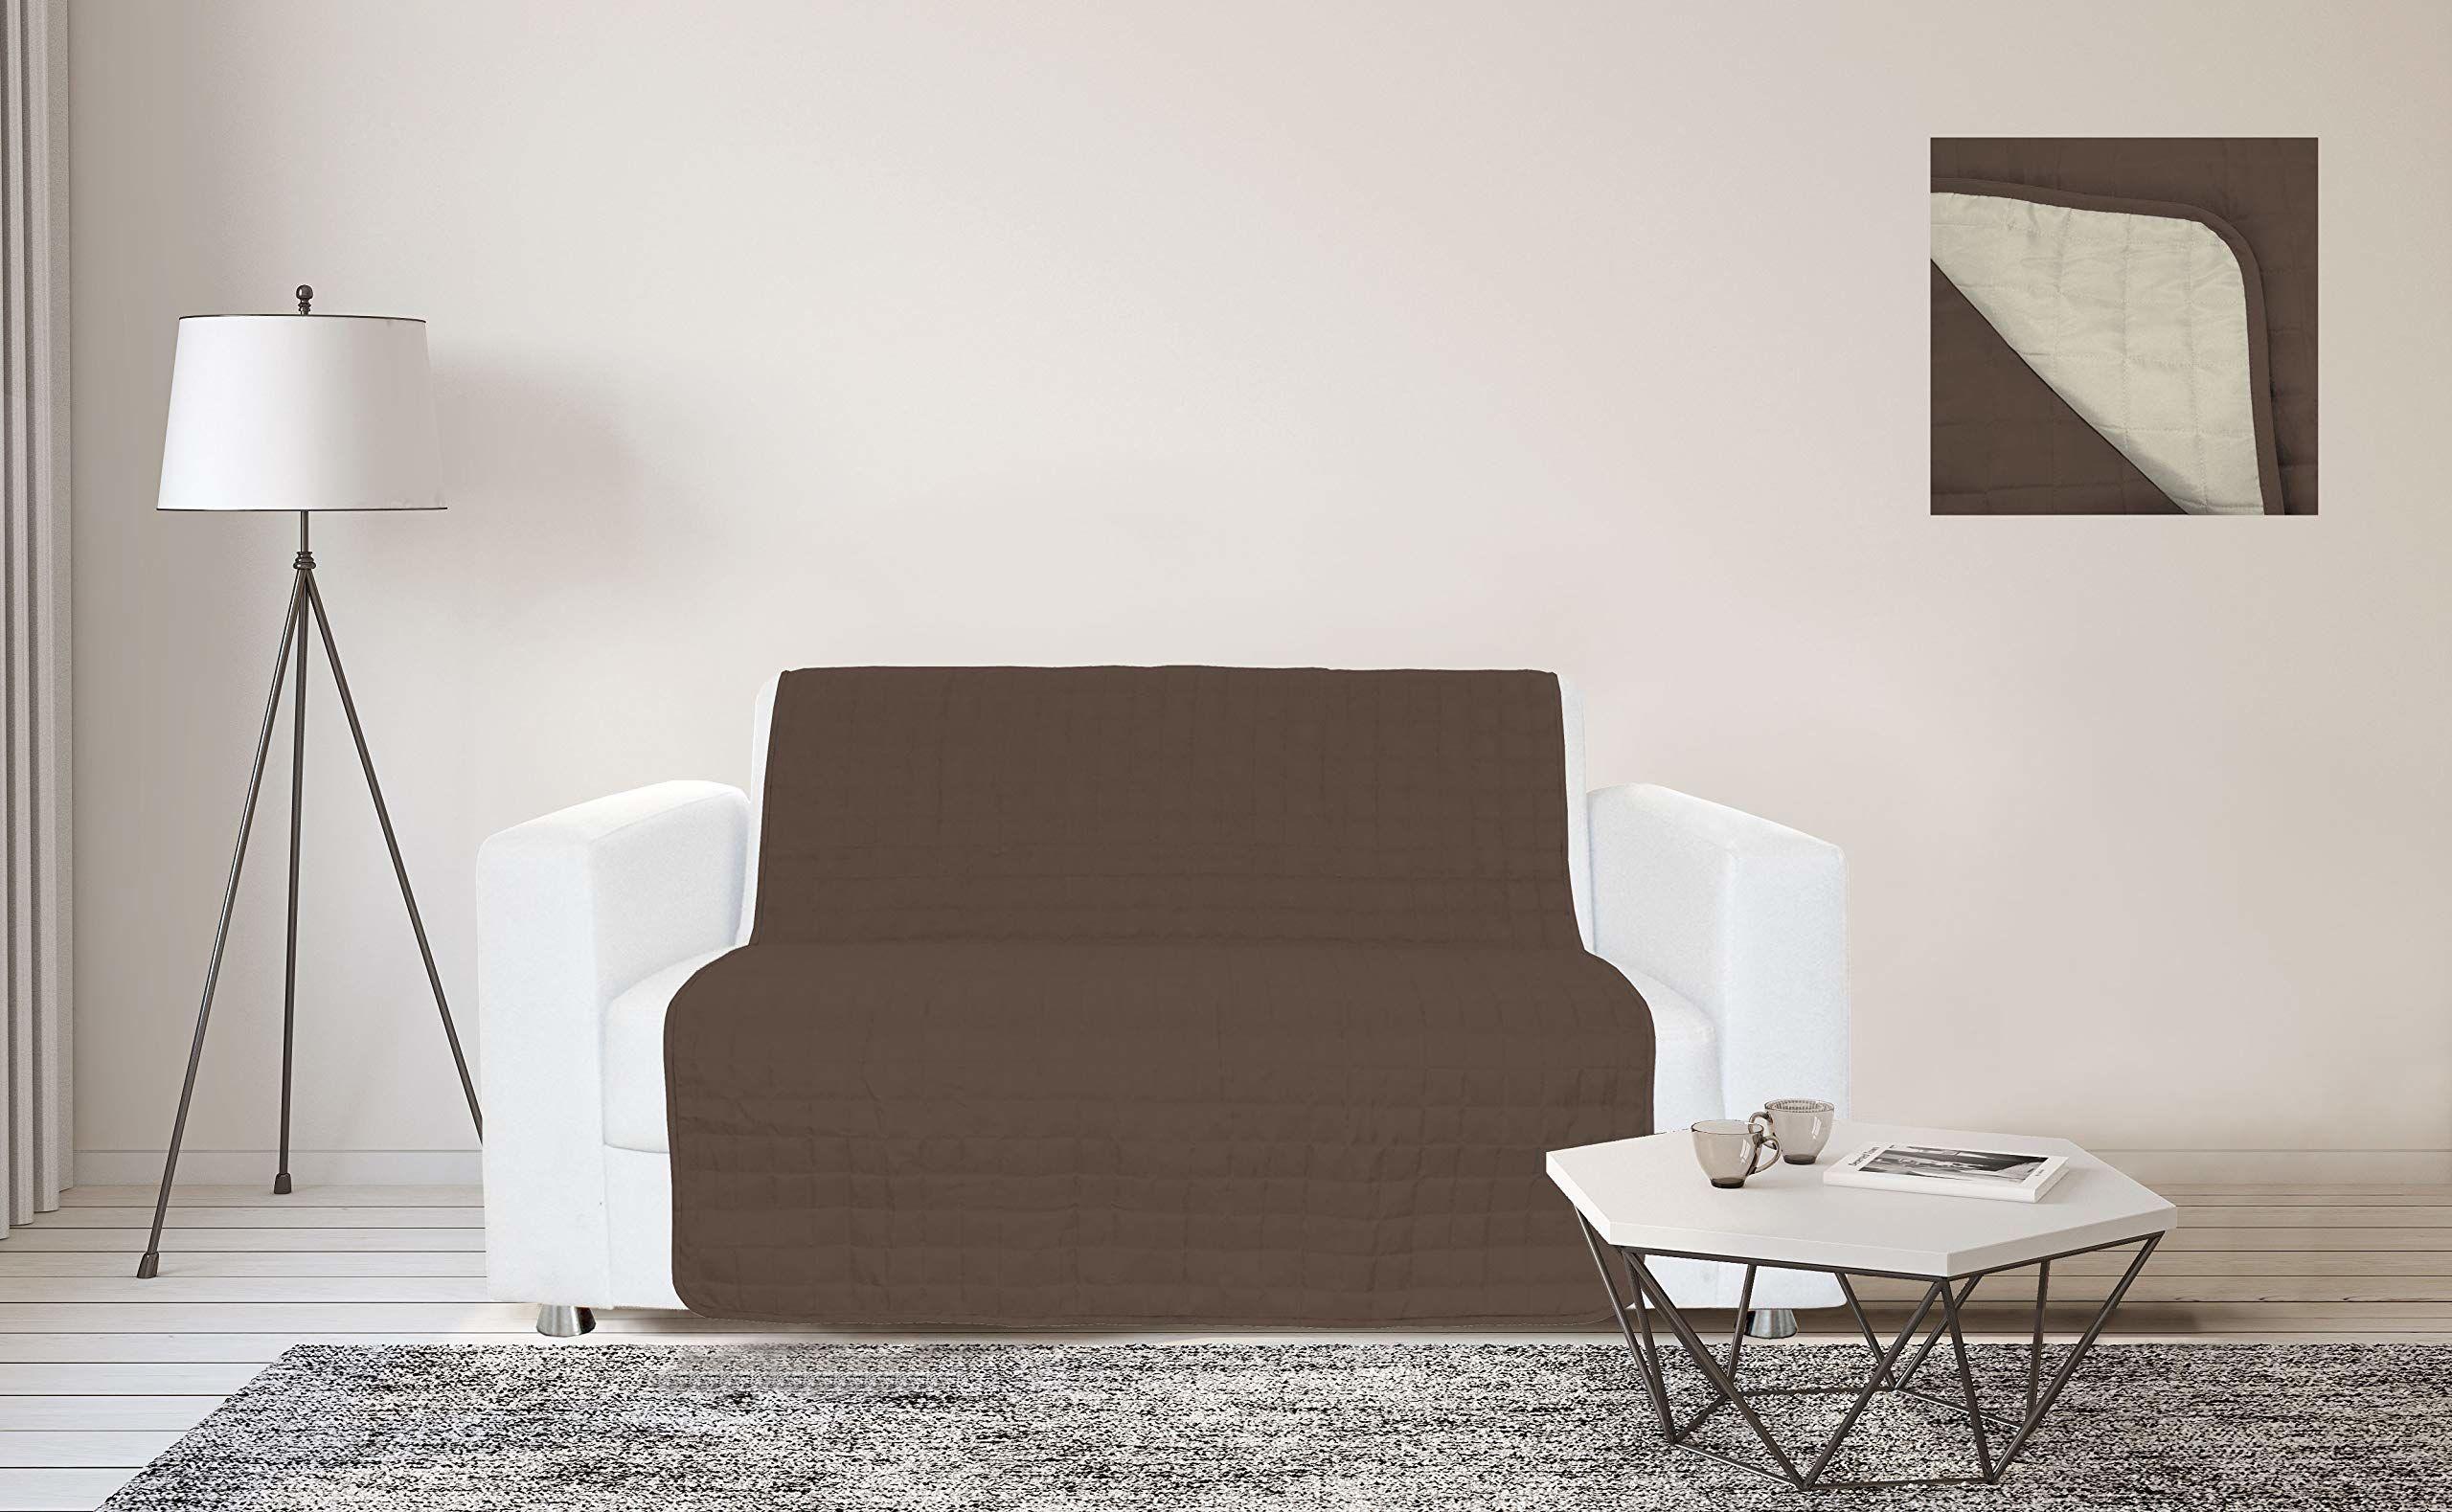 Sogni e Capricci Wodoodporny pasek na sofę, 125 x 190 cm, brązowy/kremowy, 2 miejsca